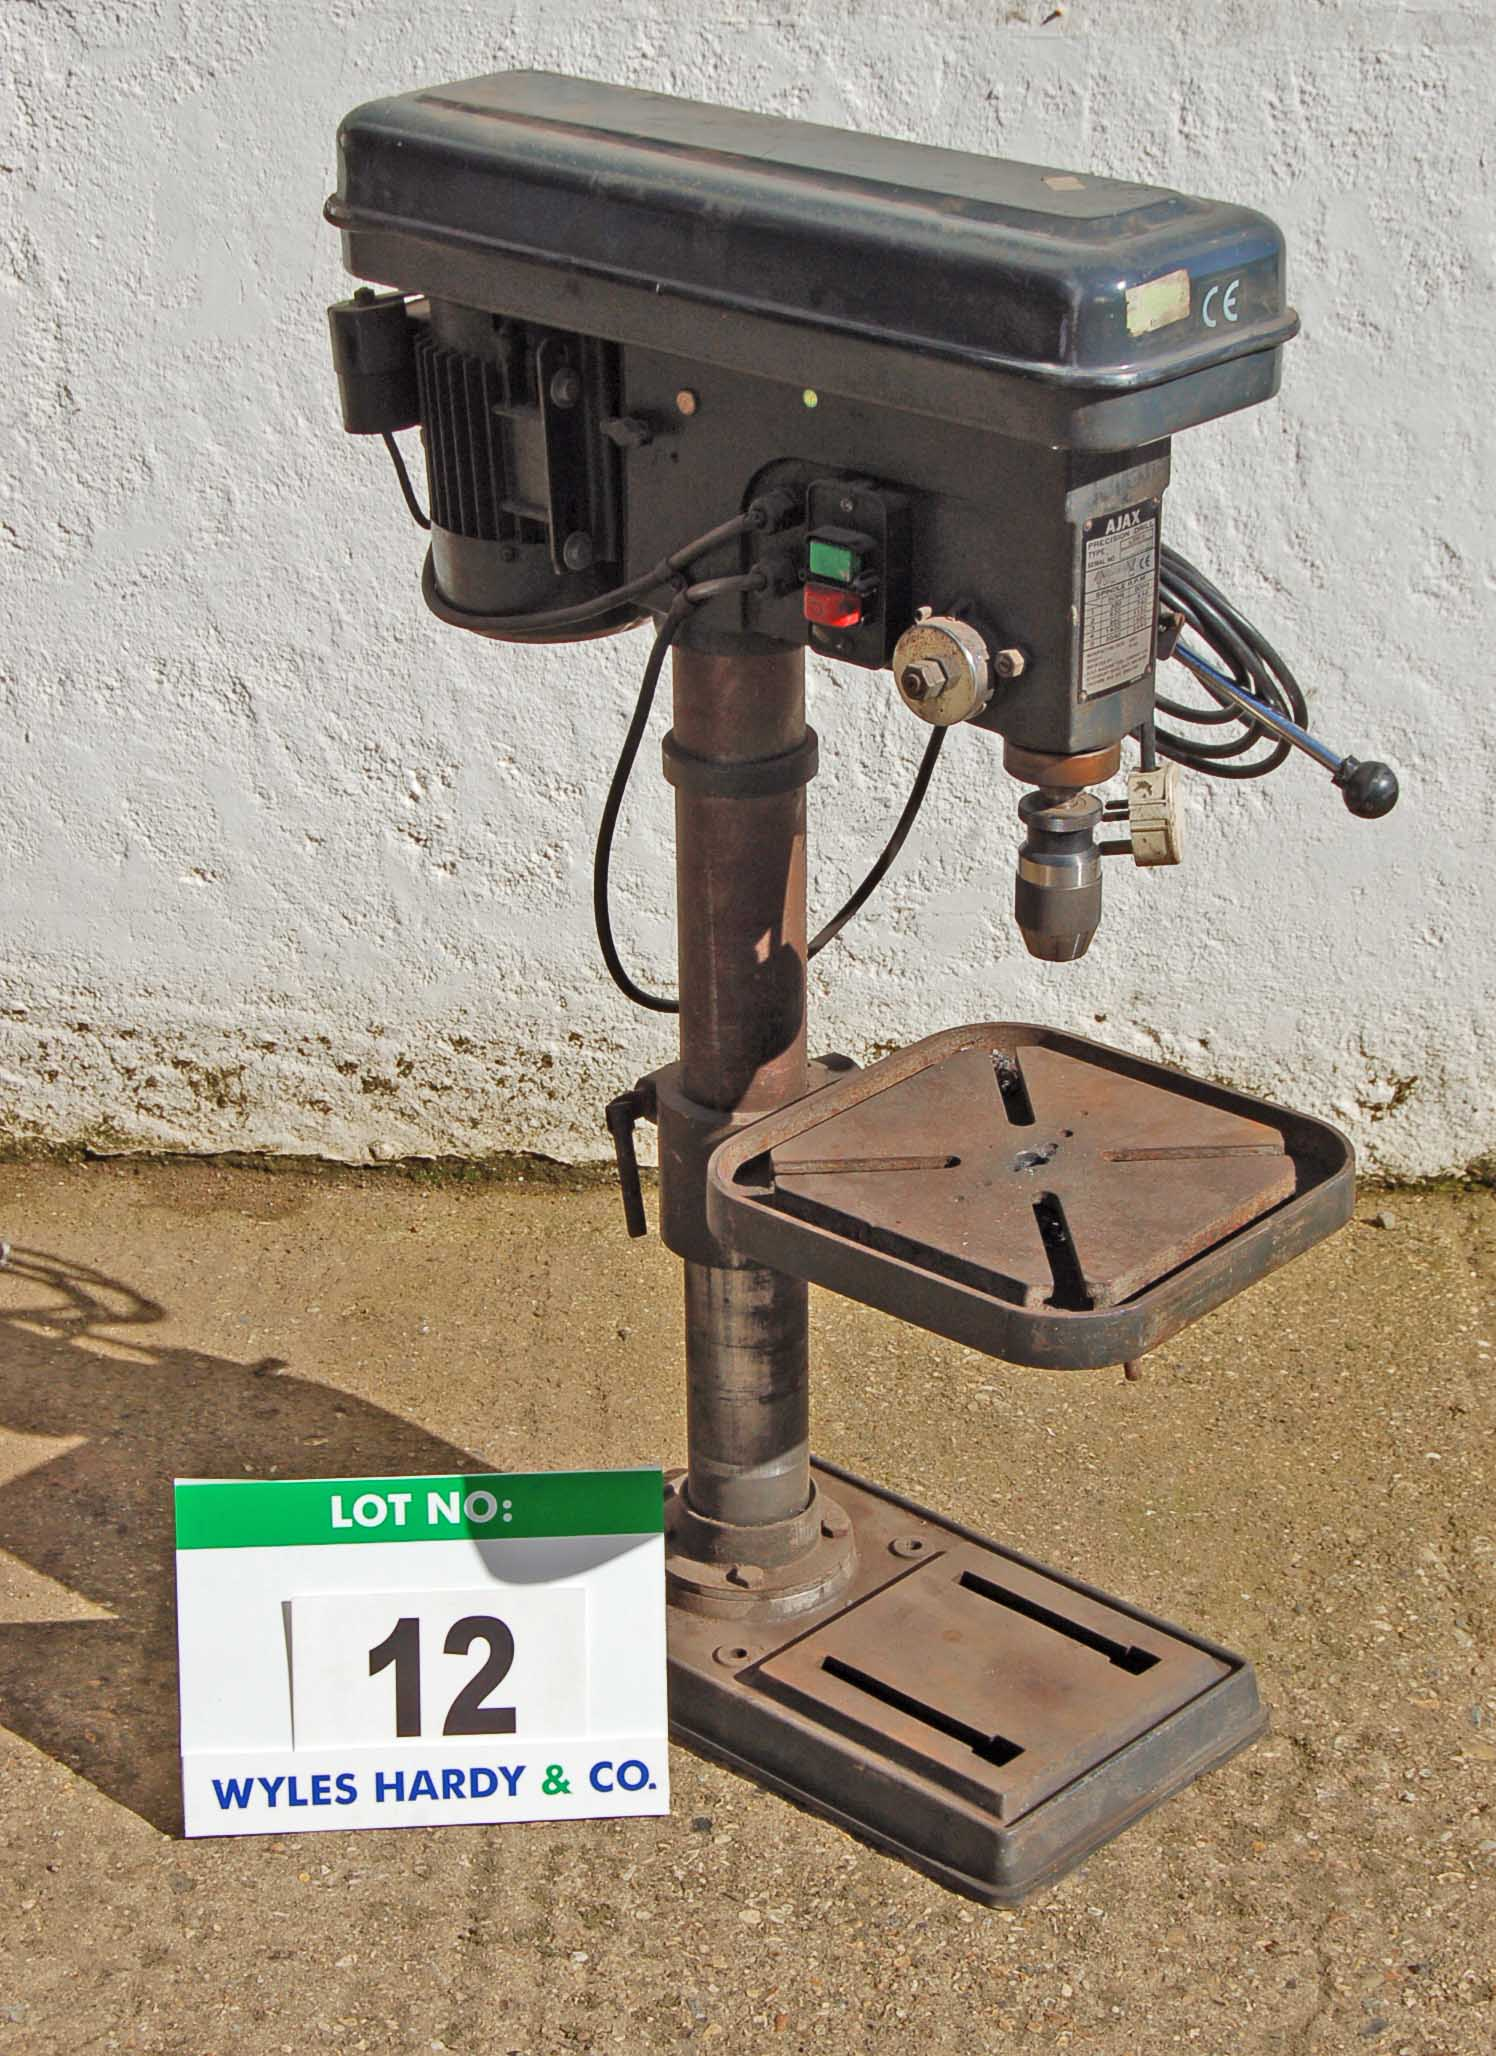 Lot 12 - AJAX AJBM16 Bench mounted Precision Drill Serial No. 04532 (240V)